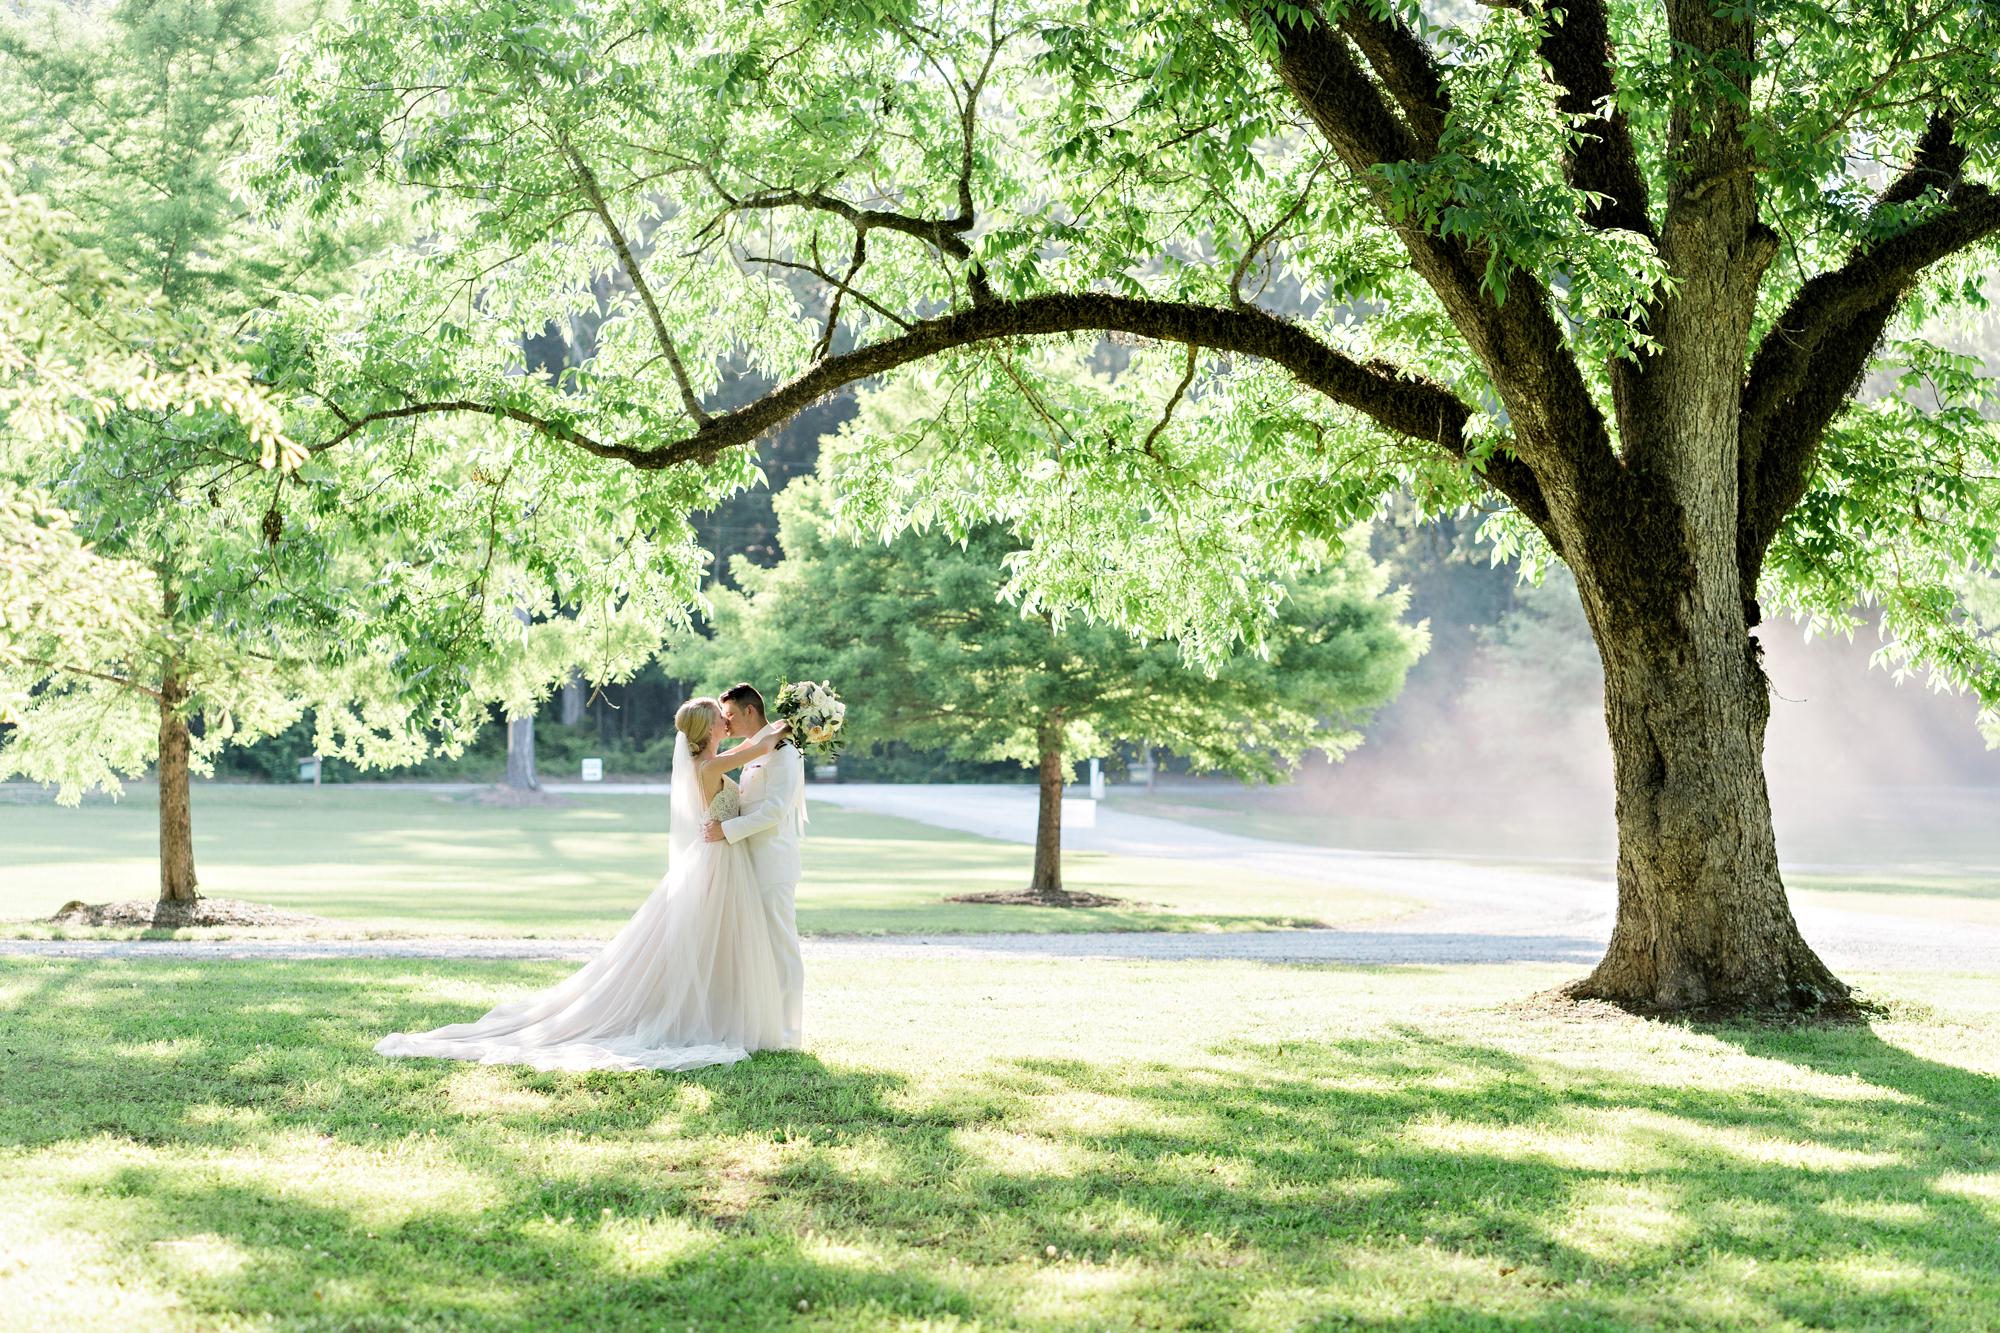 Alabama-Photographers-Nick-Drollette-Wedding-Photography-144.jpg